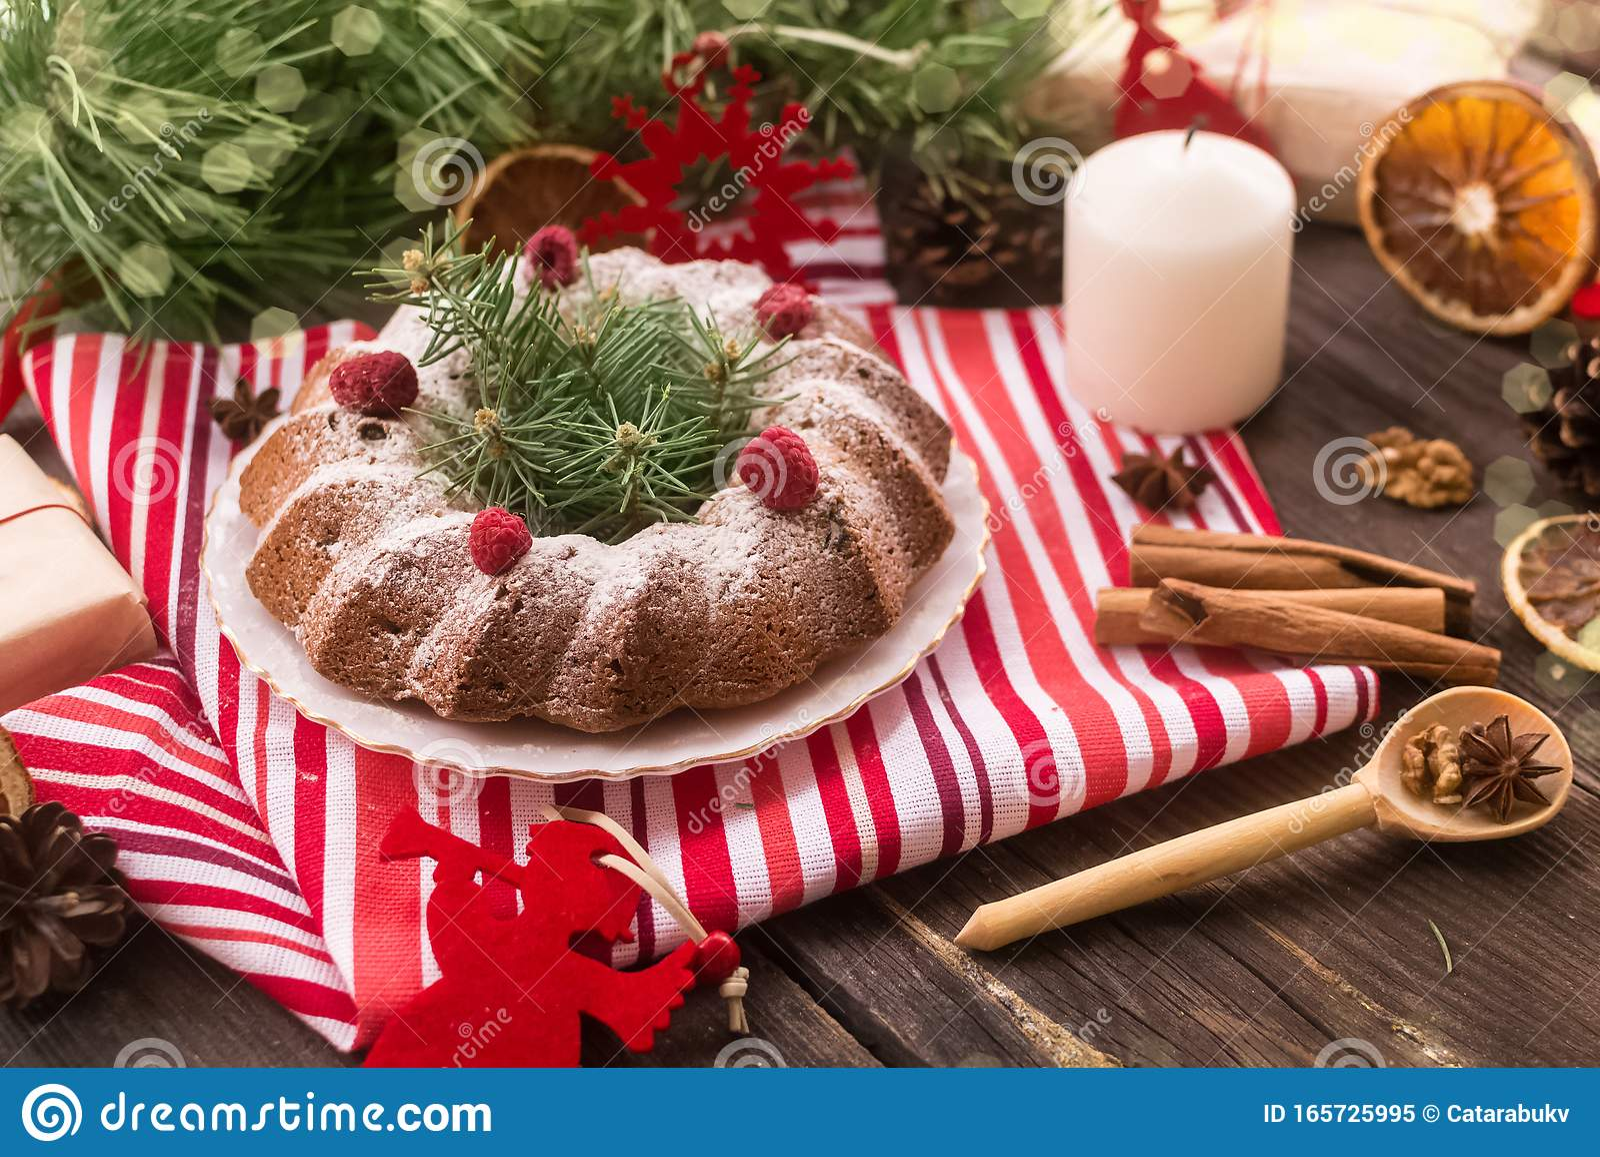 Astonishing Dairy Free Dessert Christmas Cake With Raisins And Raspberries Personalised Birthday Cards Paralily Jamesorg